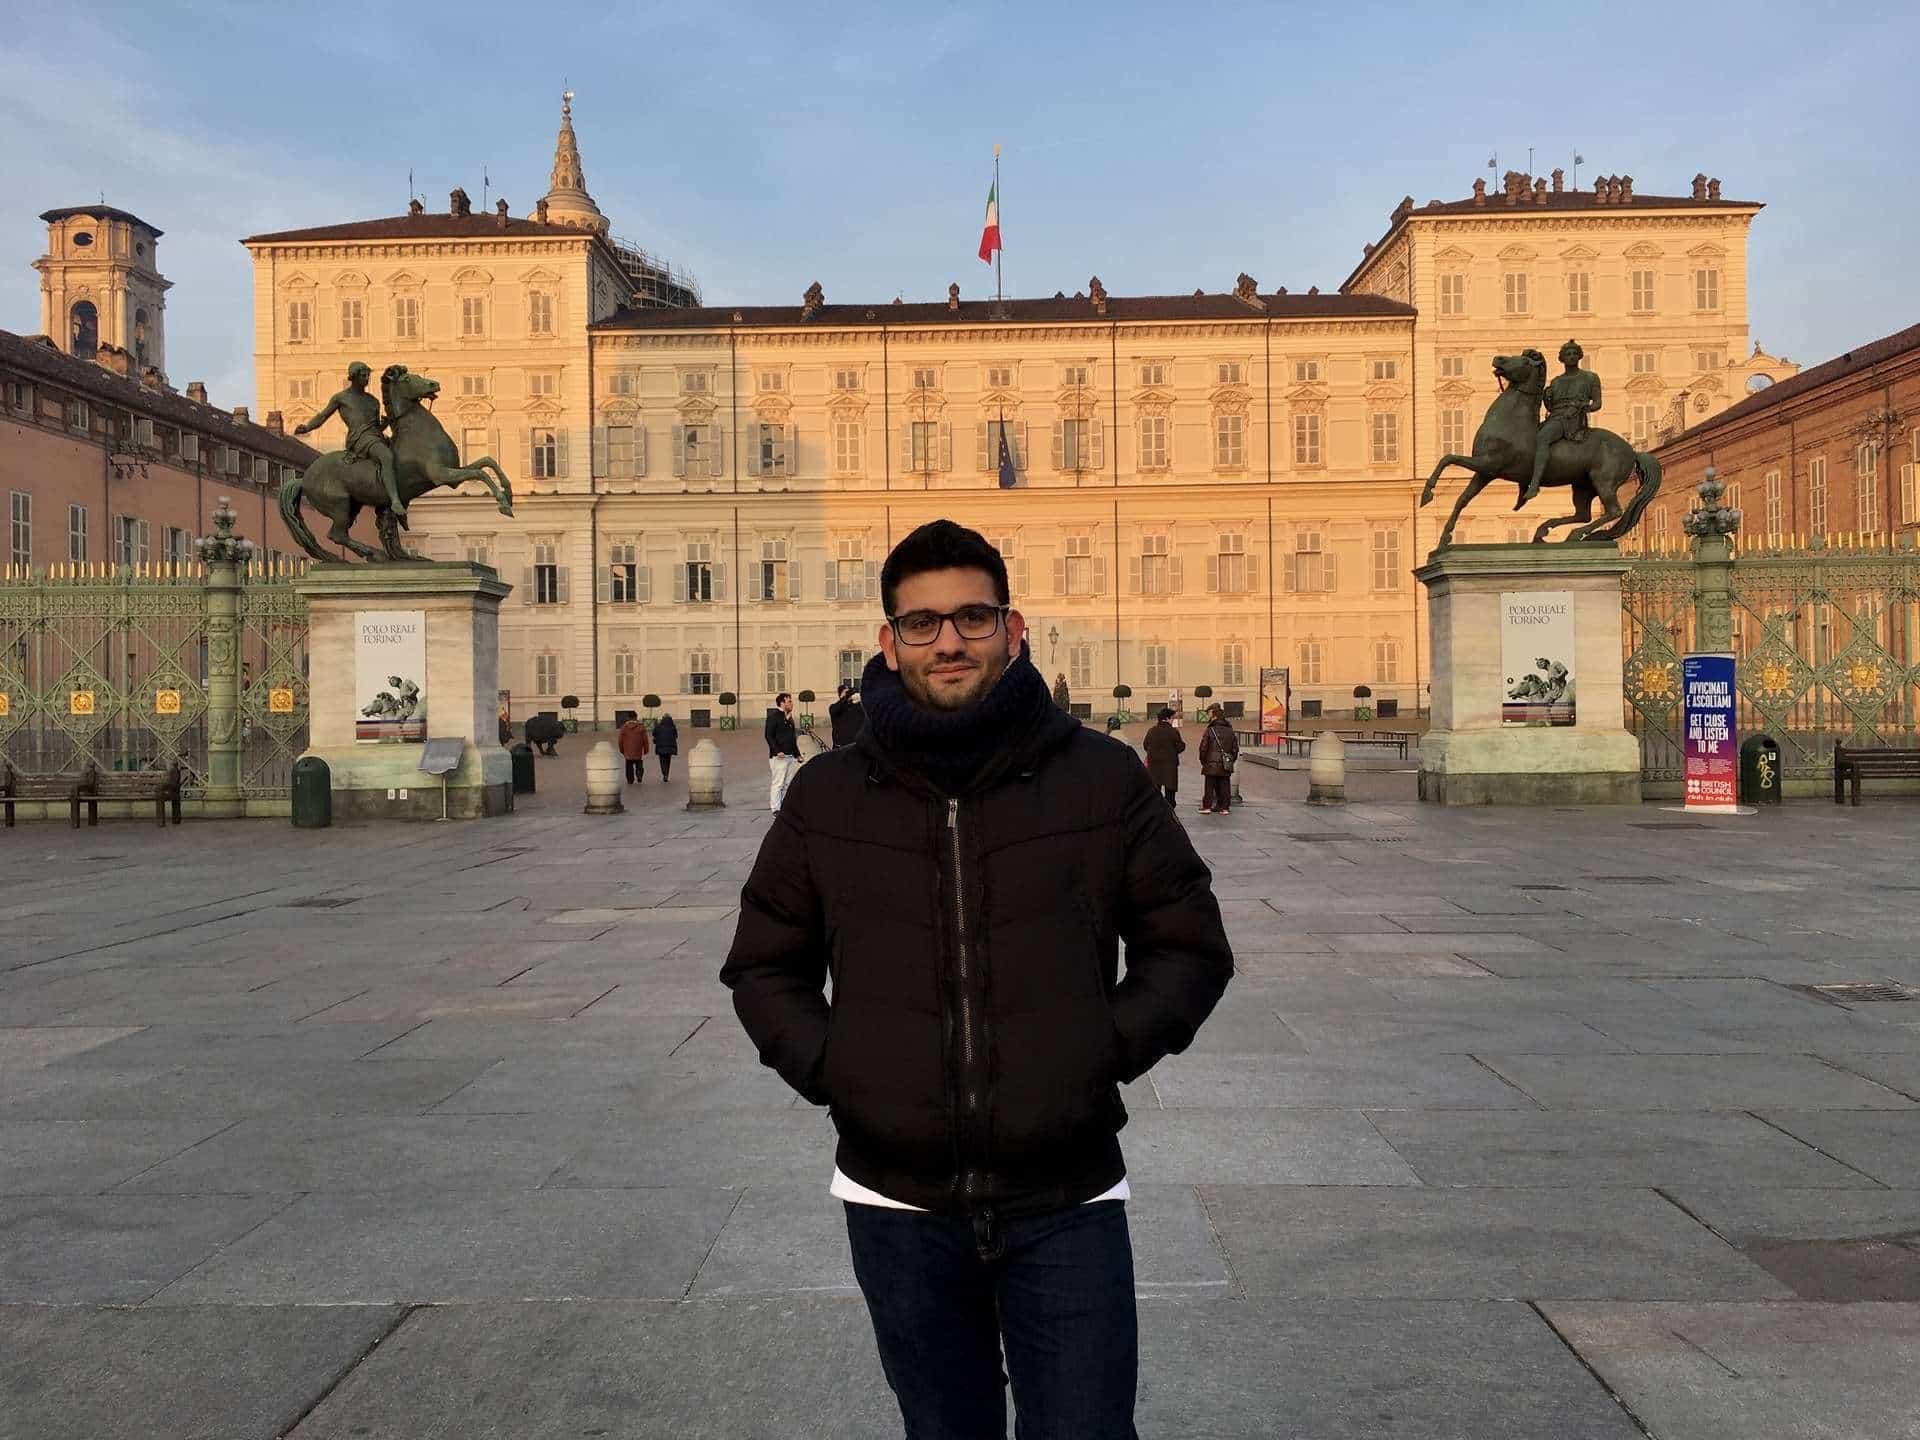 Turin Italy Palazzo Reale (royal palace)